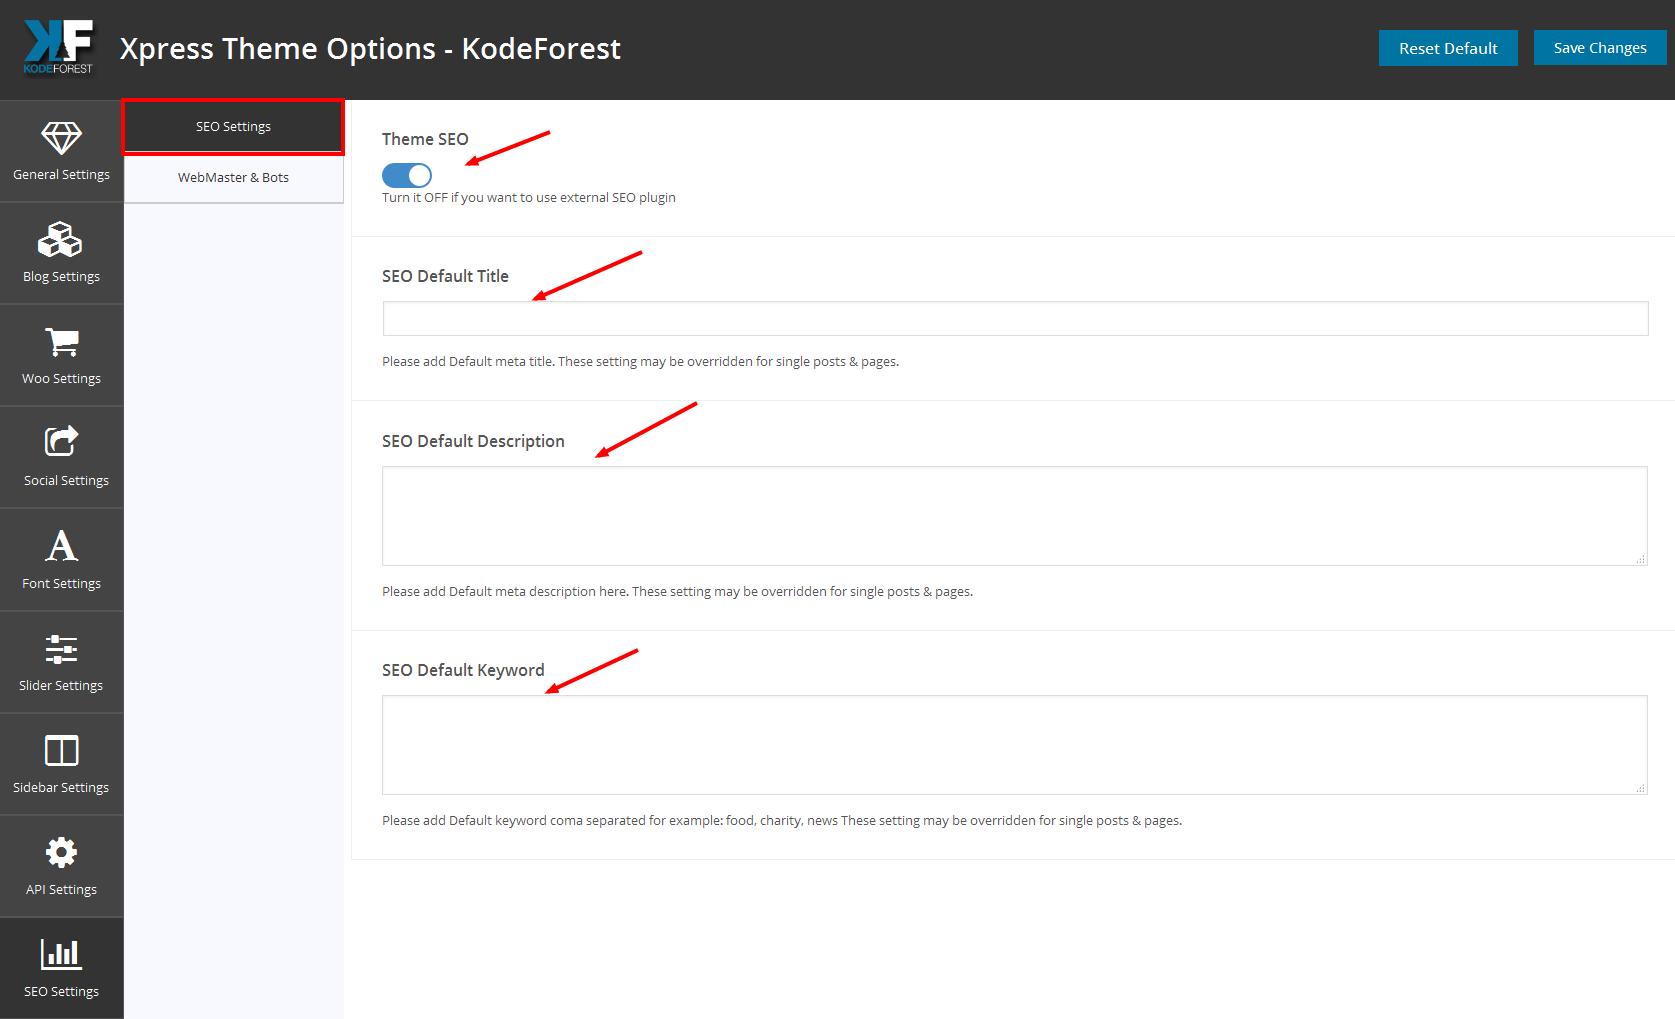 seo settings